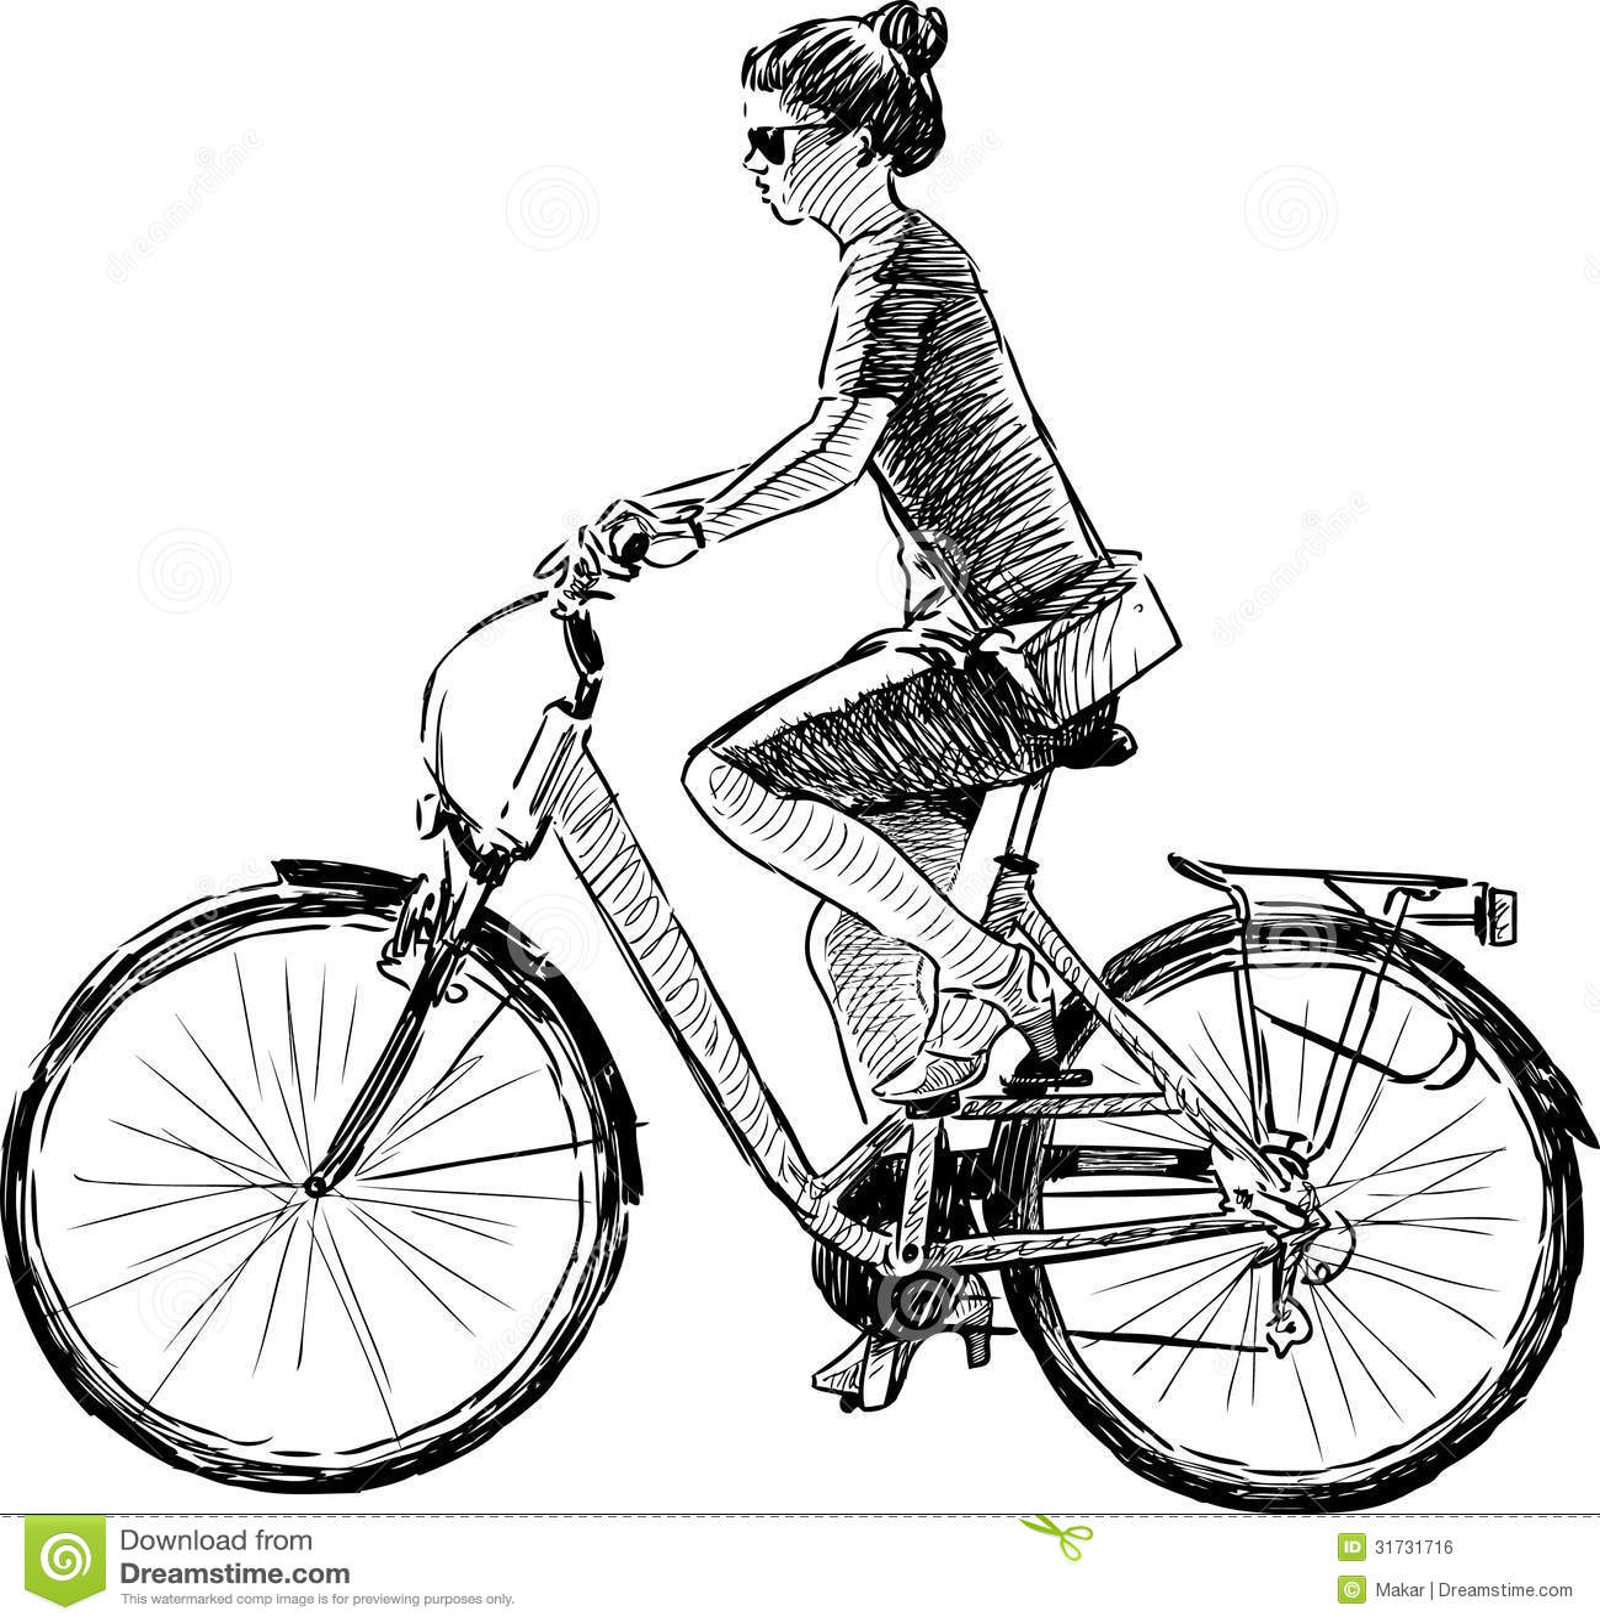 Girl Riding A Bike Royalty Free Stock Image